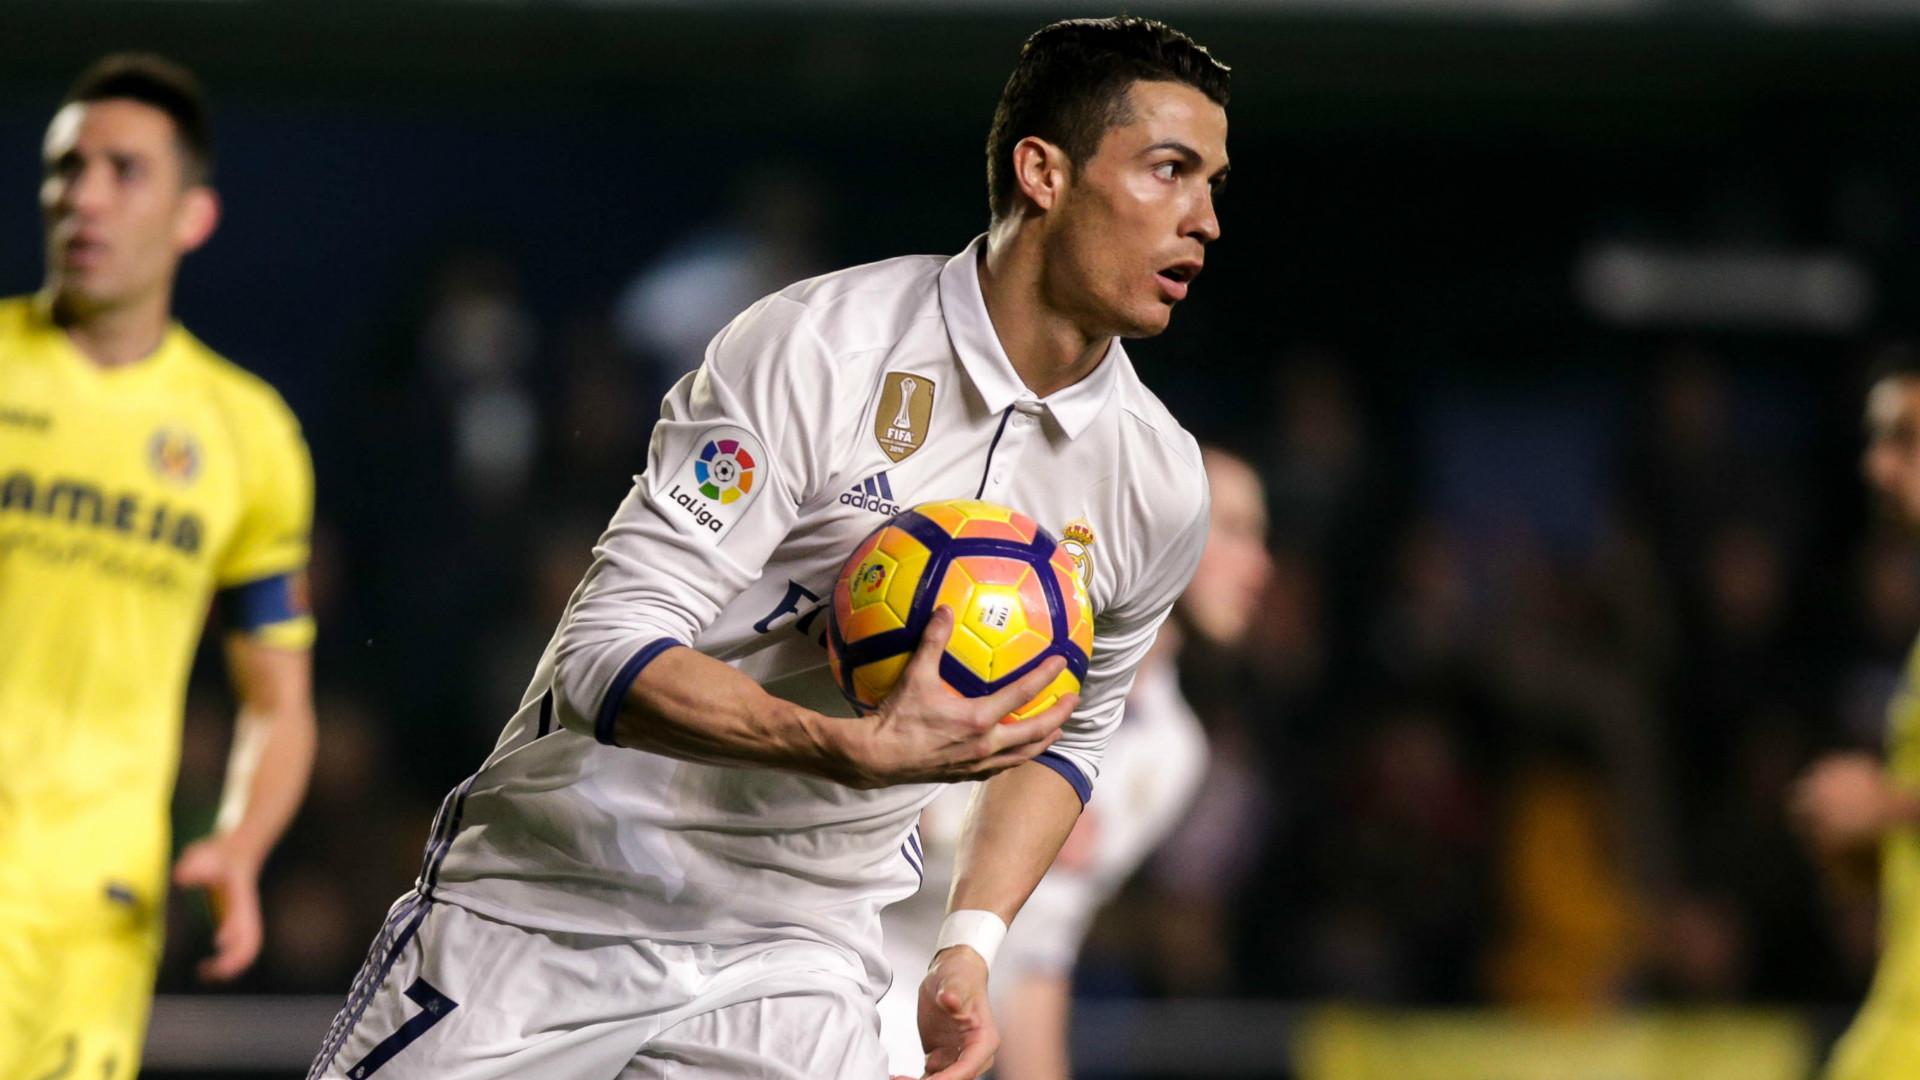 World Cup 2018: Cristiano Ronaldo saves Portugal in classic clash C ronaldo pictures 2018